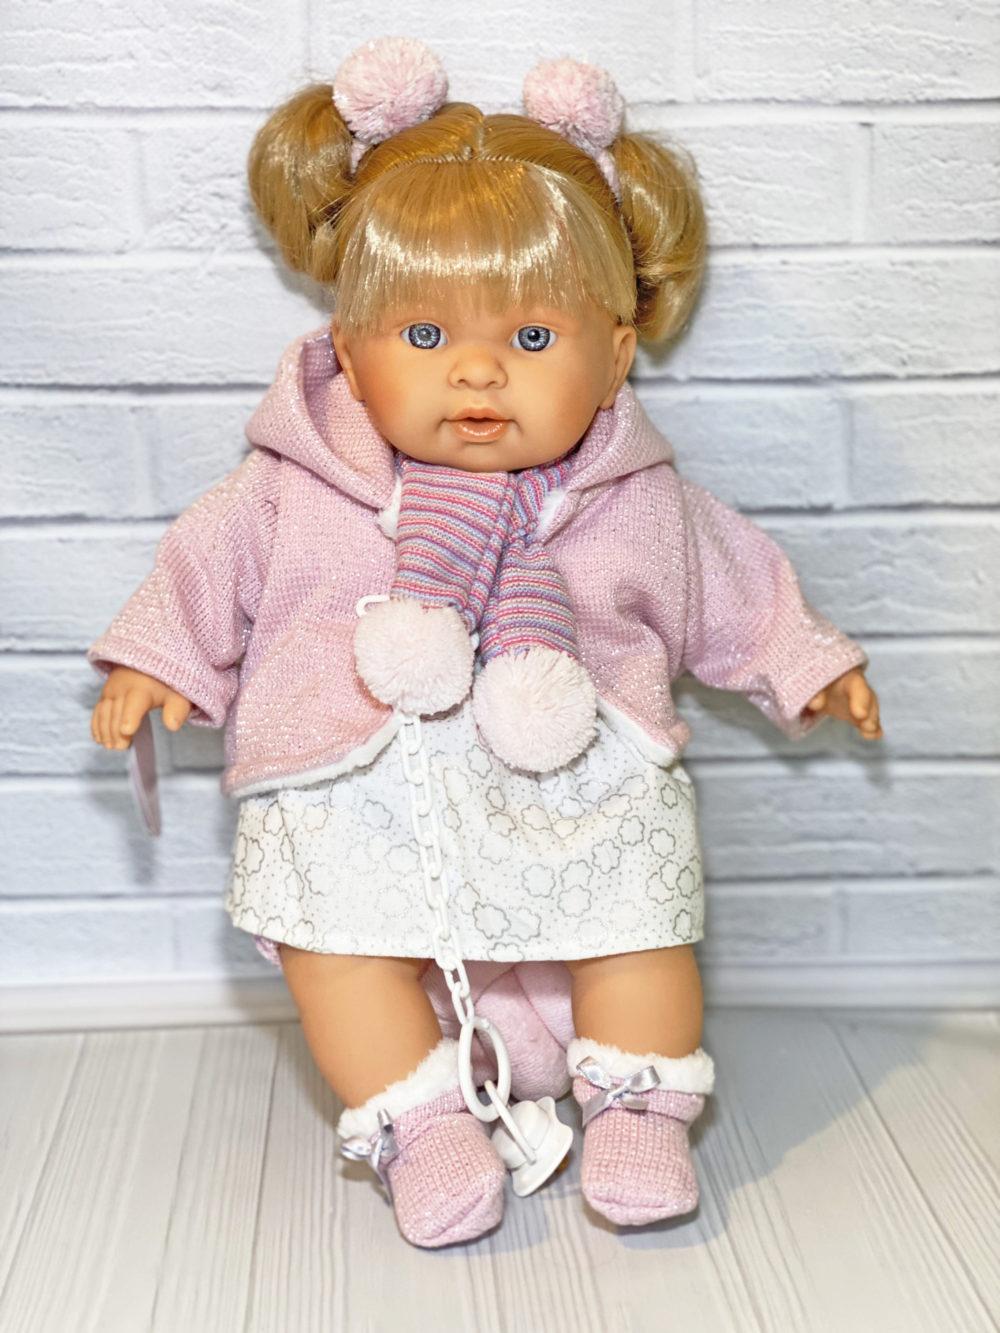 Кукла Alexandra от фабрики Llorens